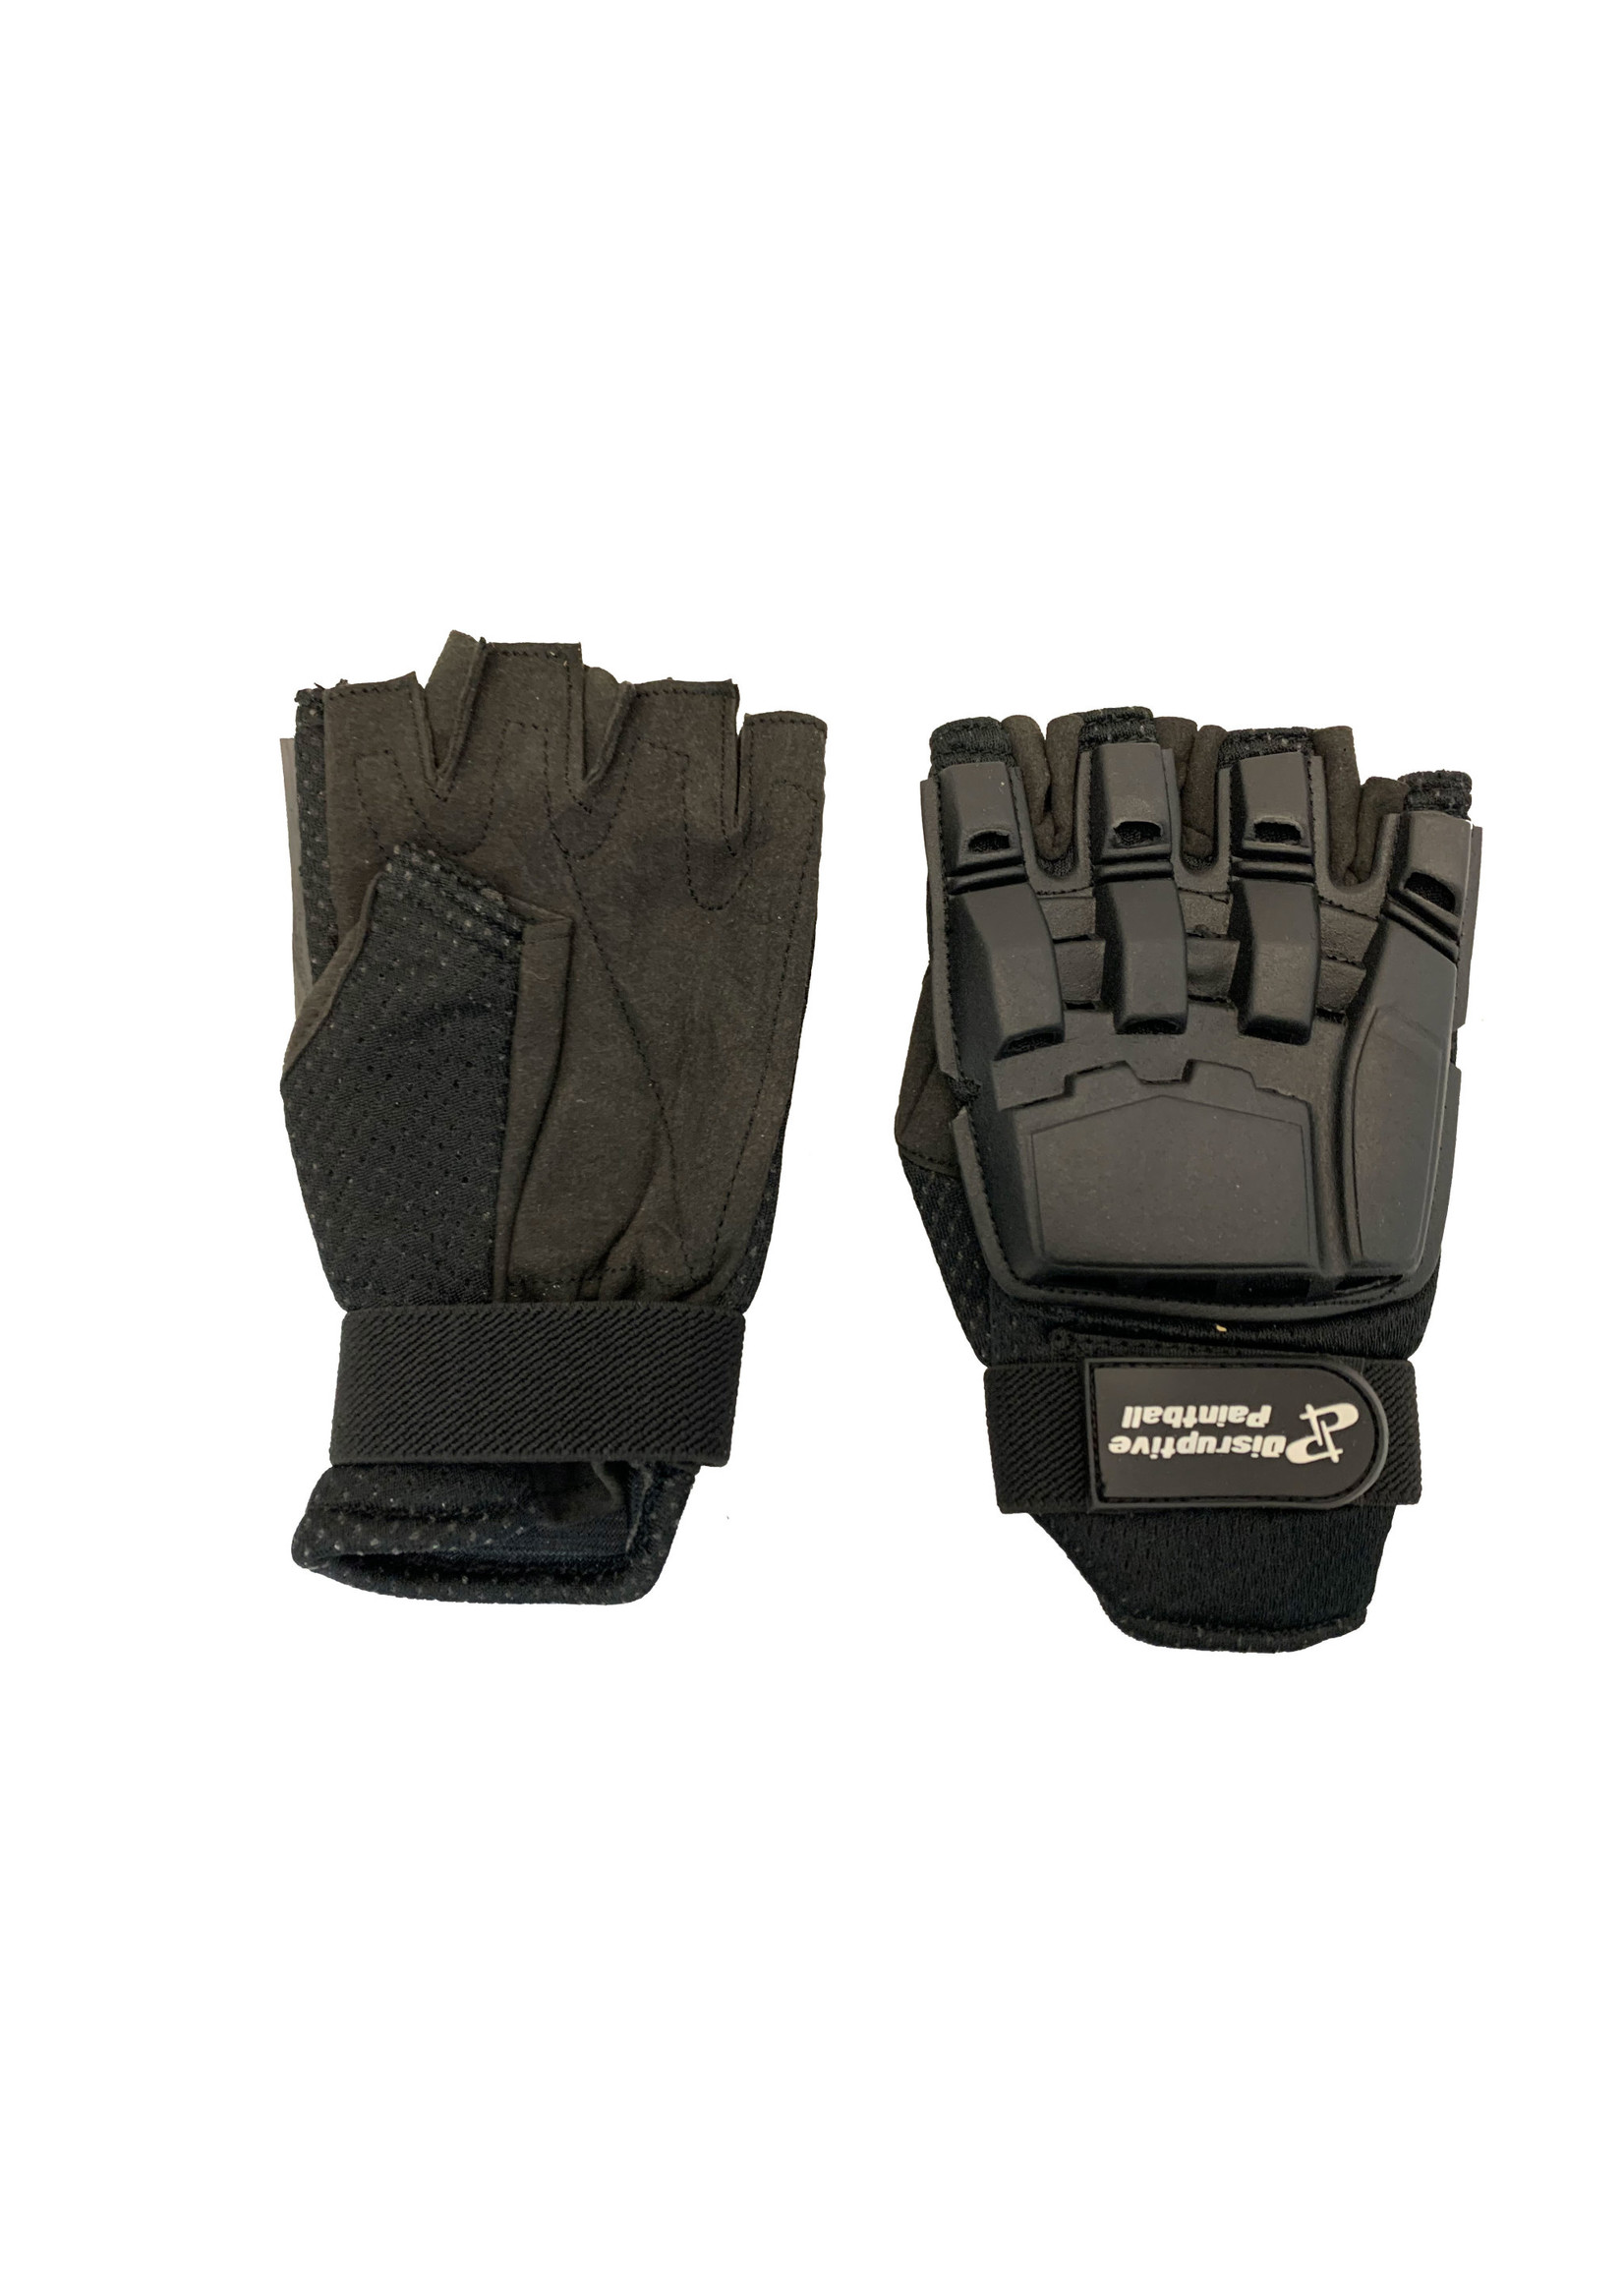 Disruptive Products Disruptive Armor Rec Glove